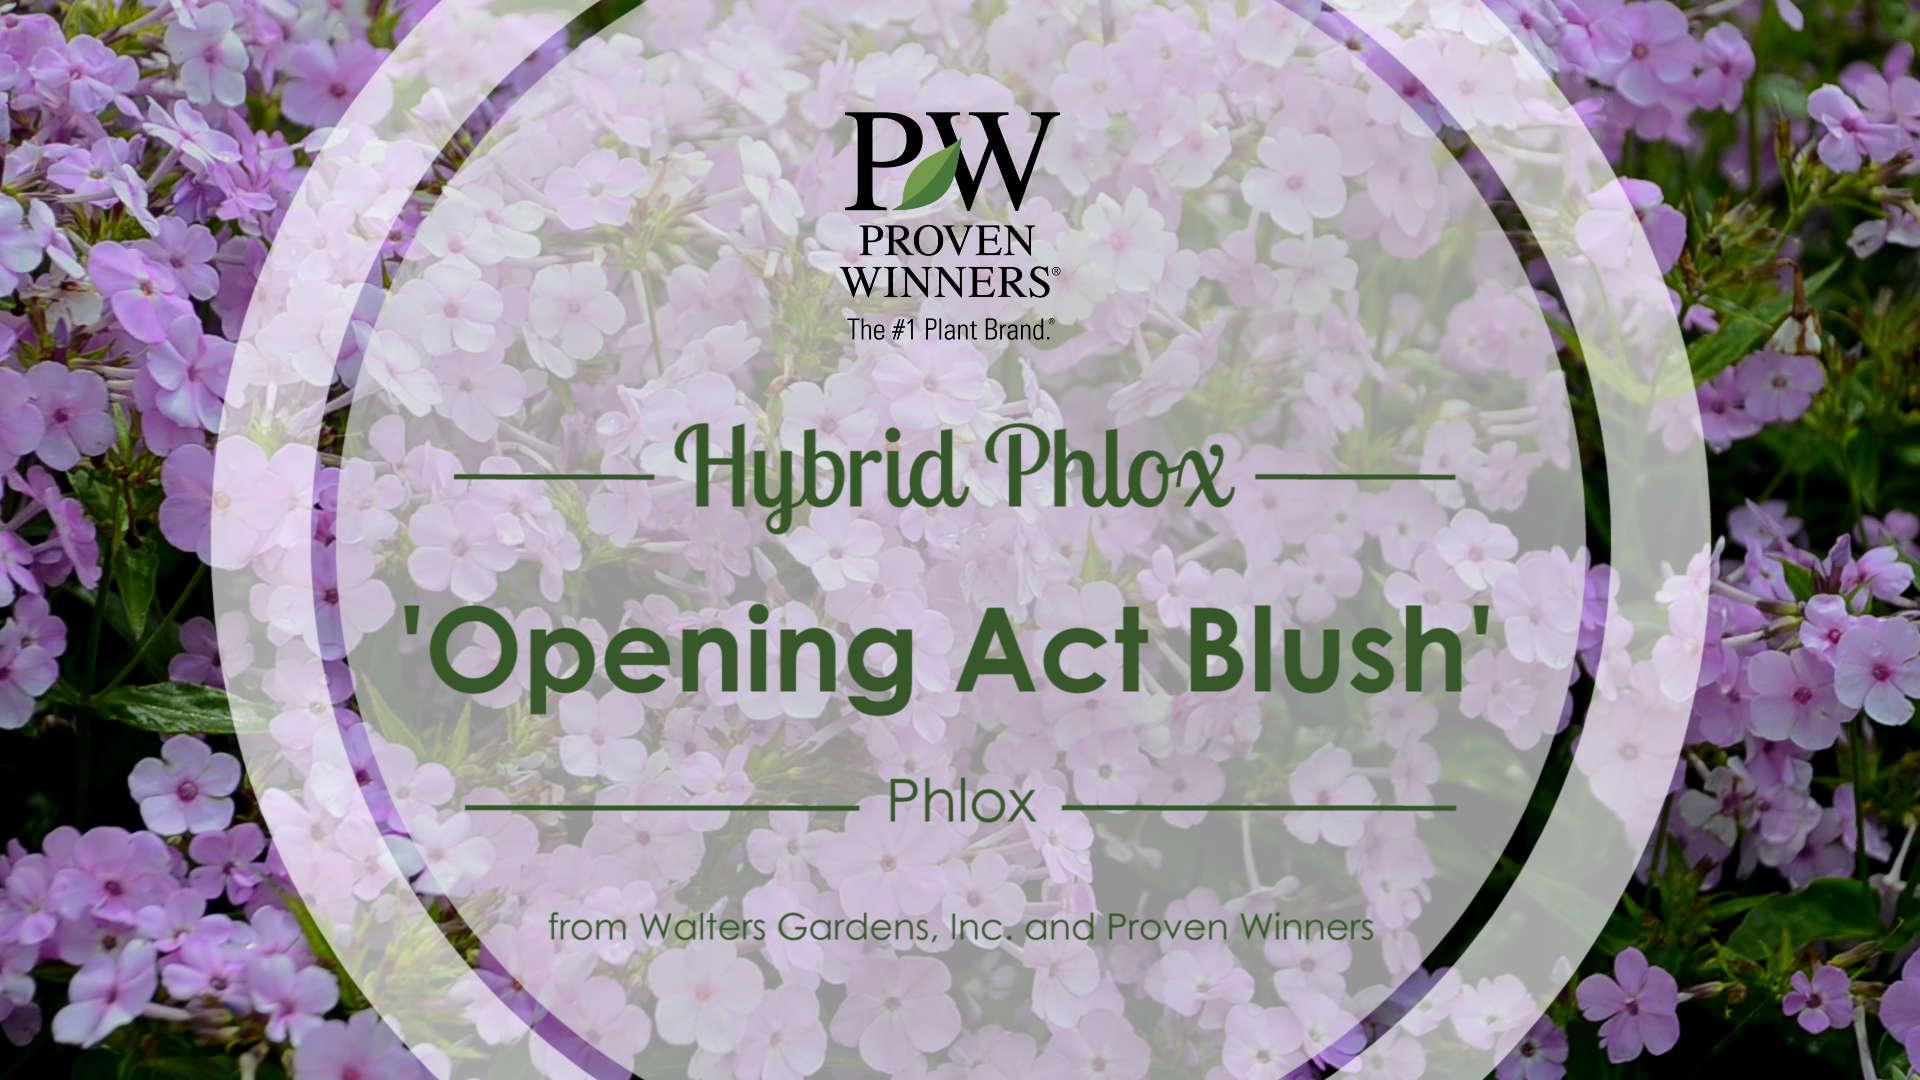 Phlox 'Opening Act Blush' Hybrid Phlox